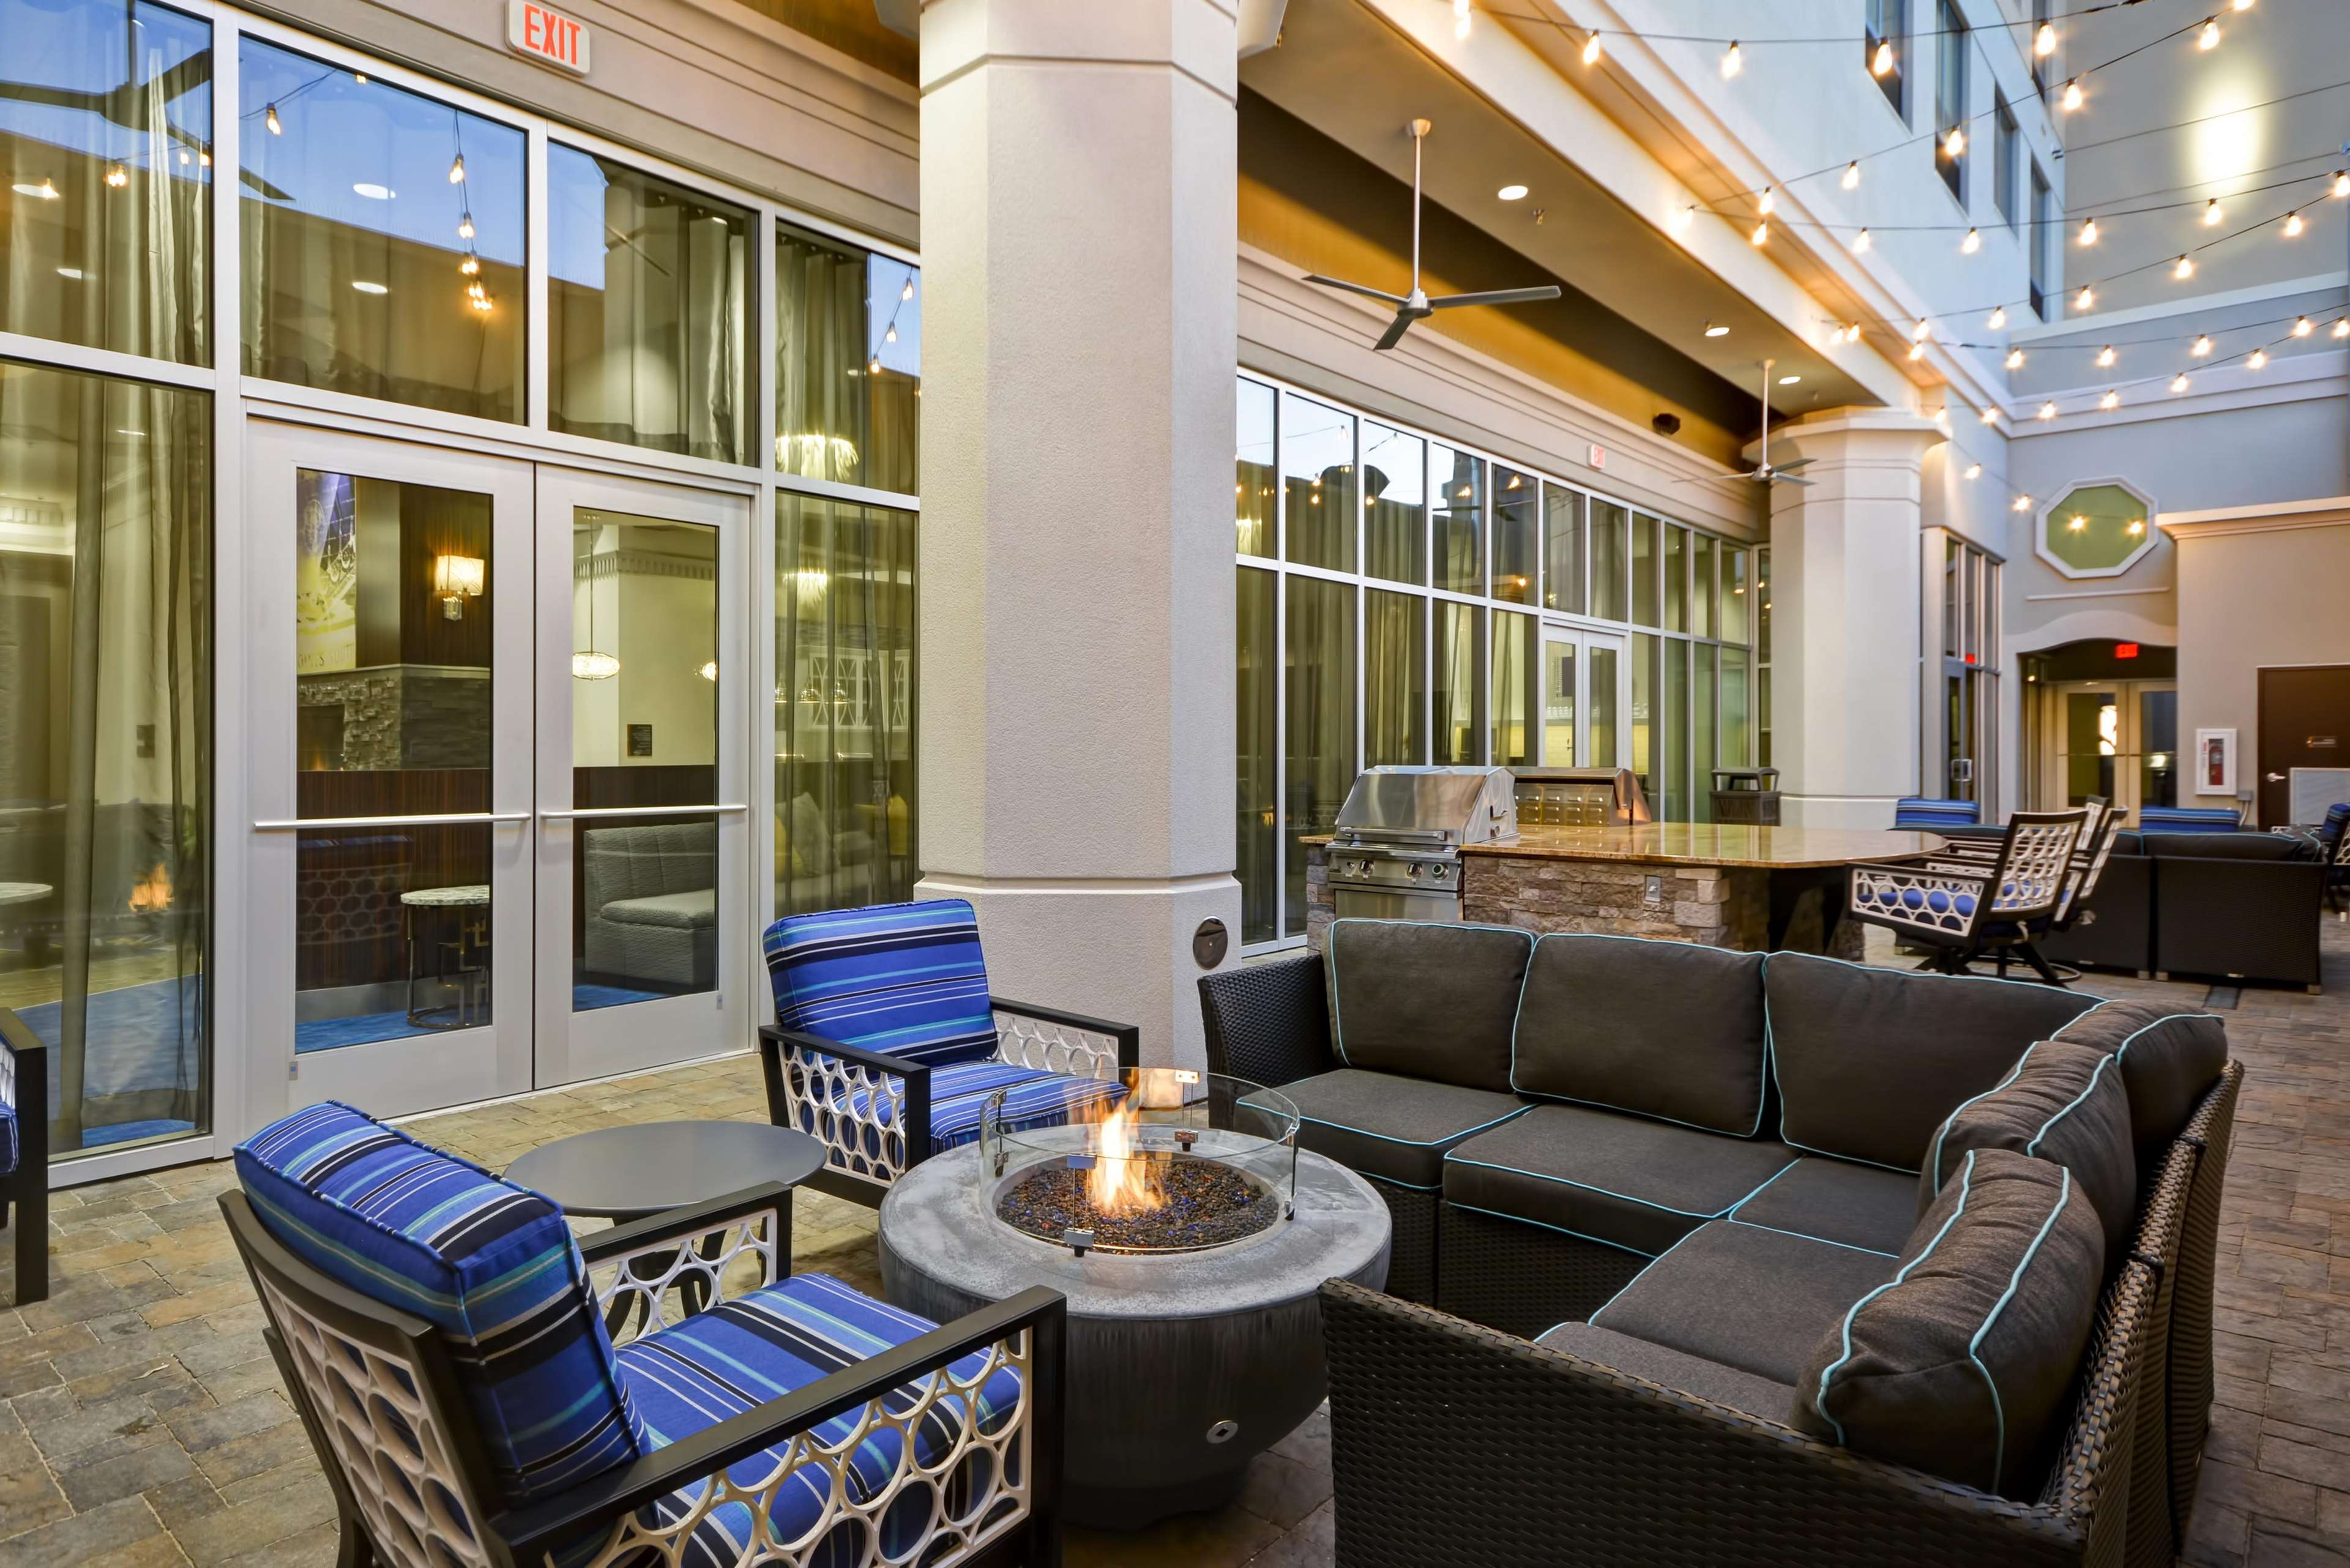 Homewood Suites by Hilton Birmingham Downtown Near UAB image 36